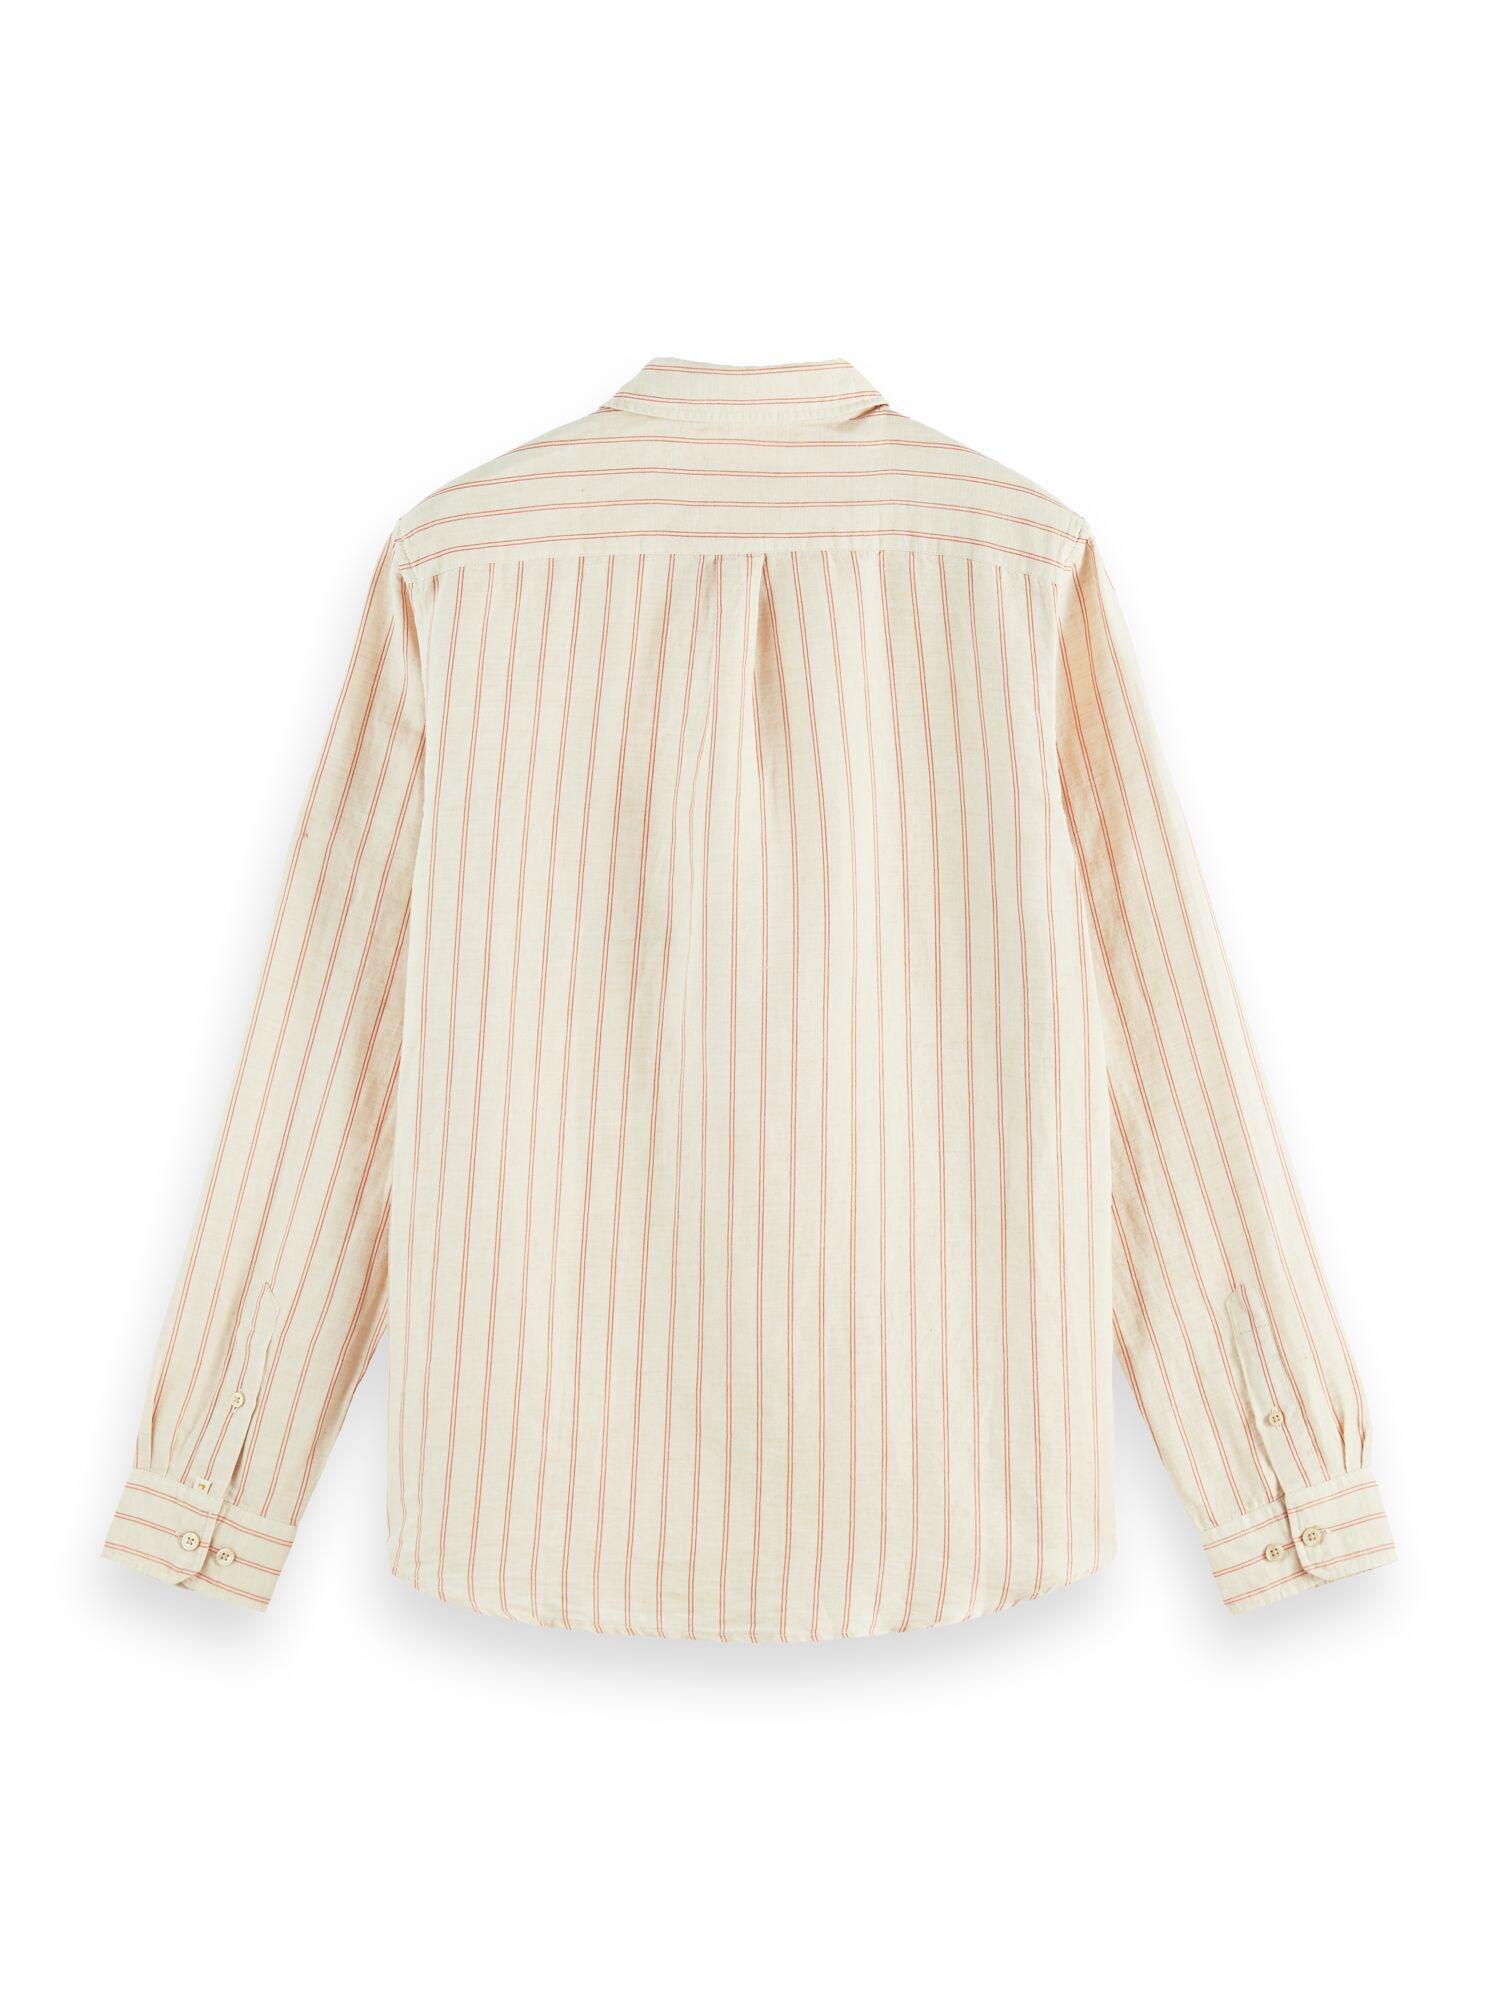 Scotch & Soda | REGULAR FIT- Striped shirt with organic cotton blend